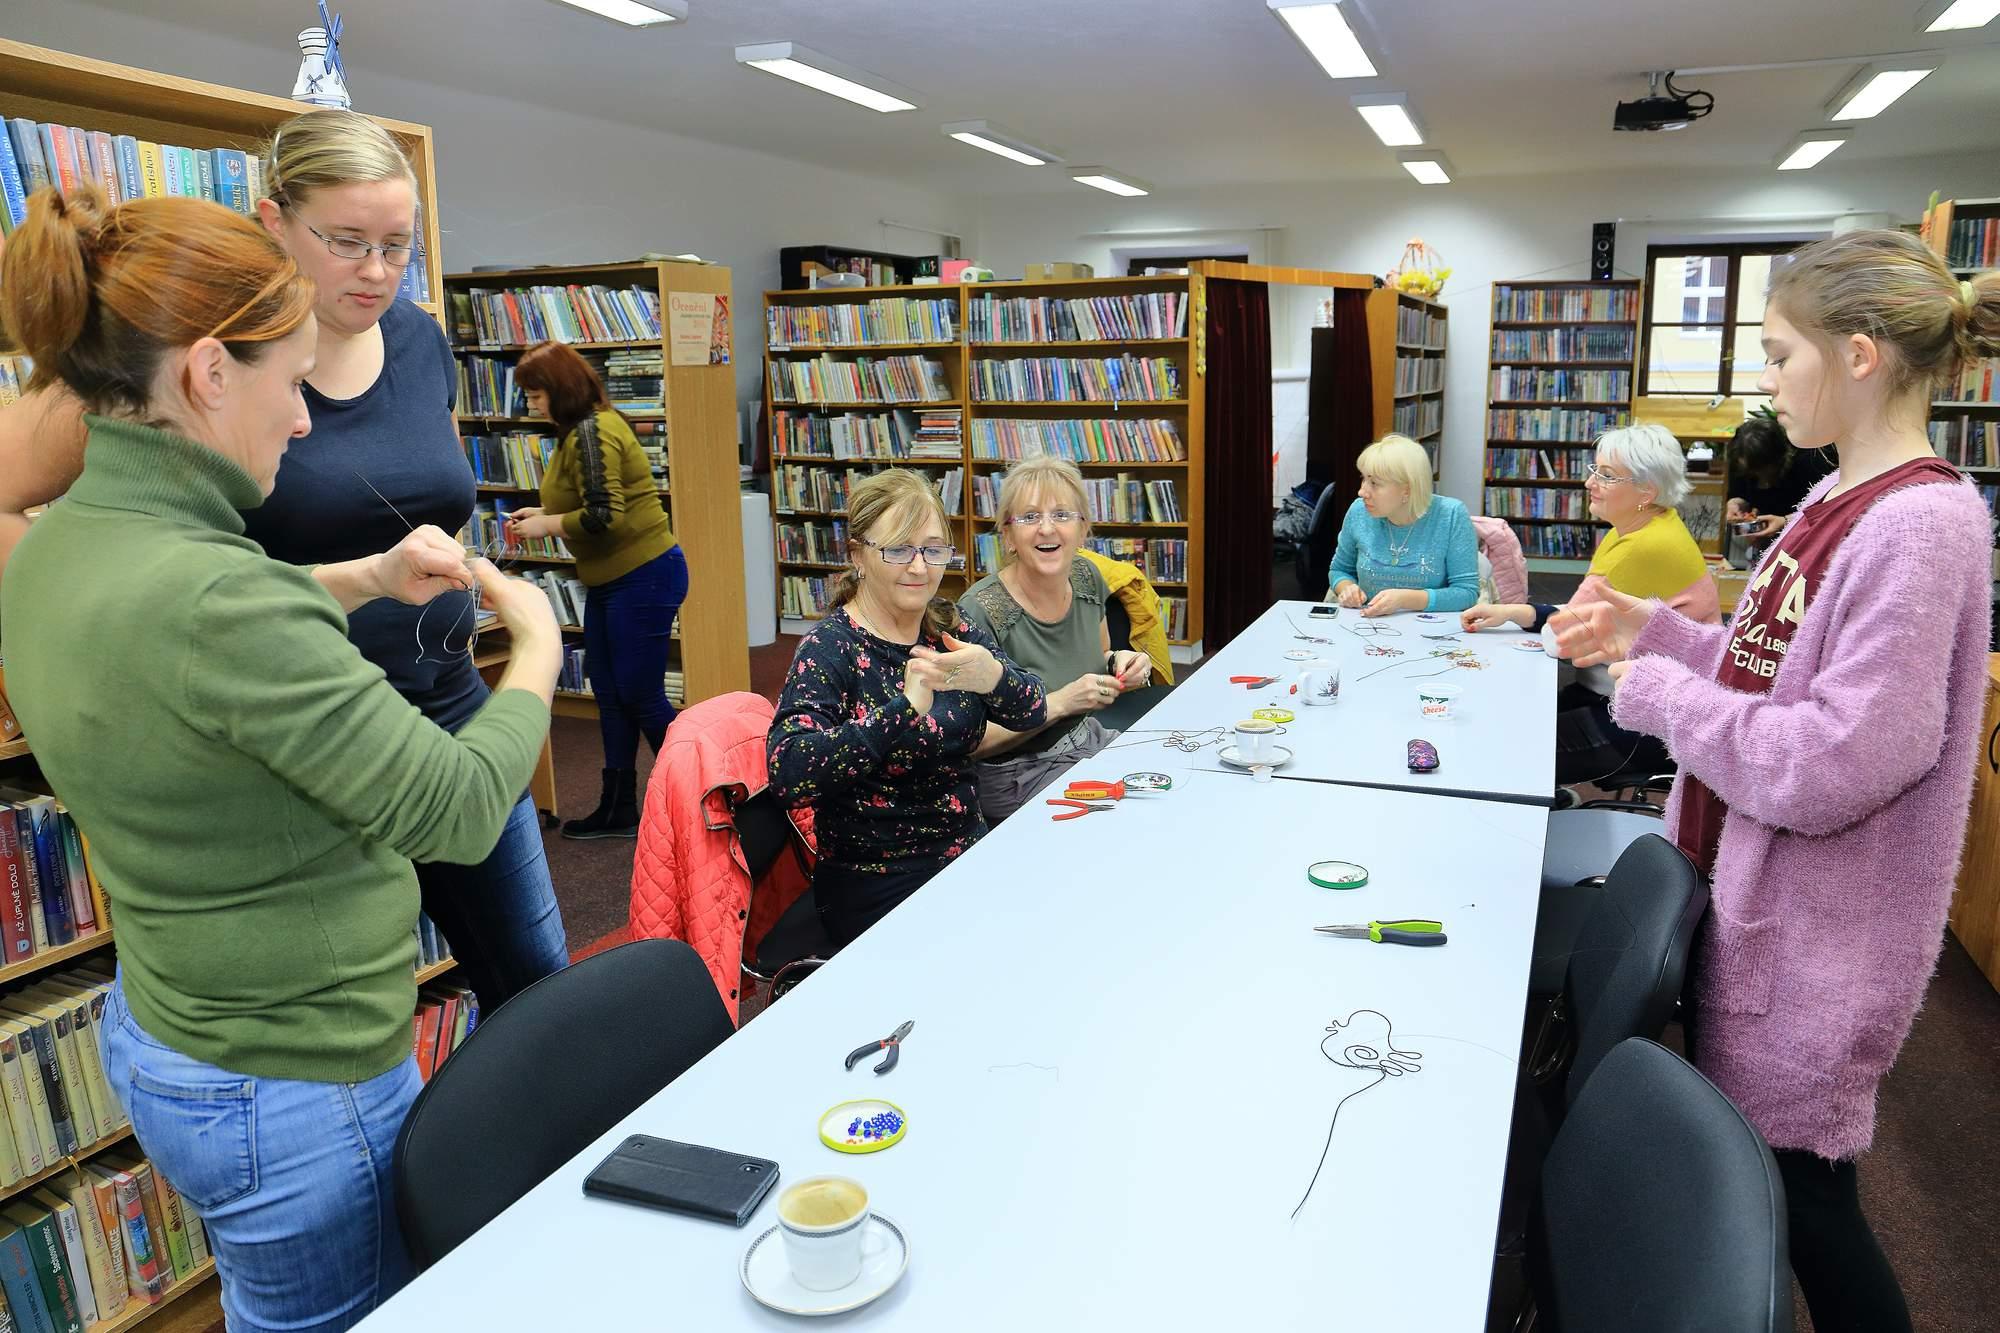 Akce for 29.3.2019 Obecn knihovna a infocentrum Beneov